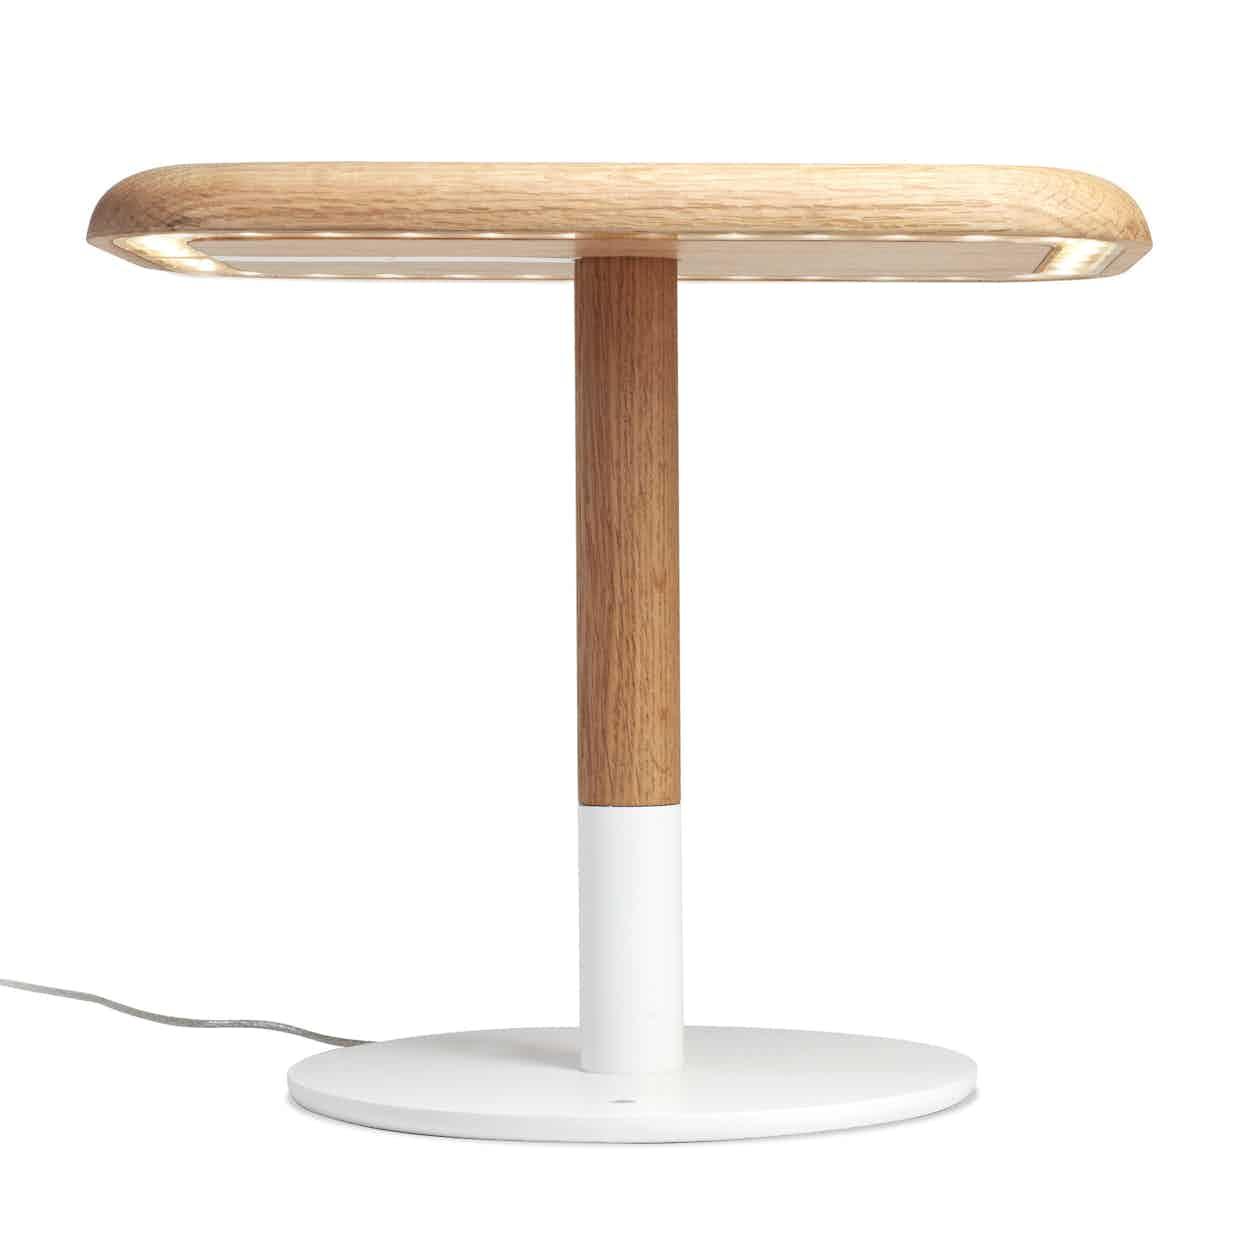 Arpel lighting woody table lamp front haute living